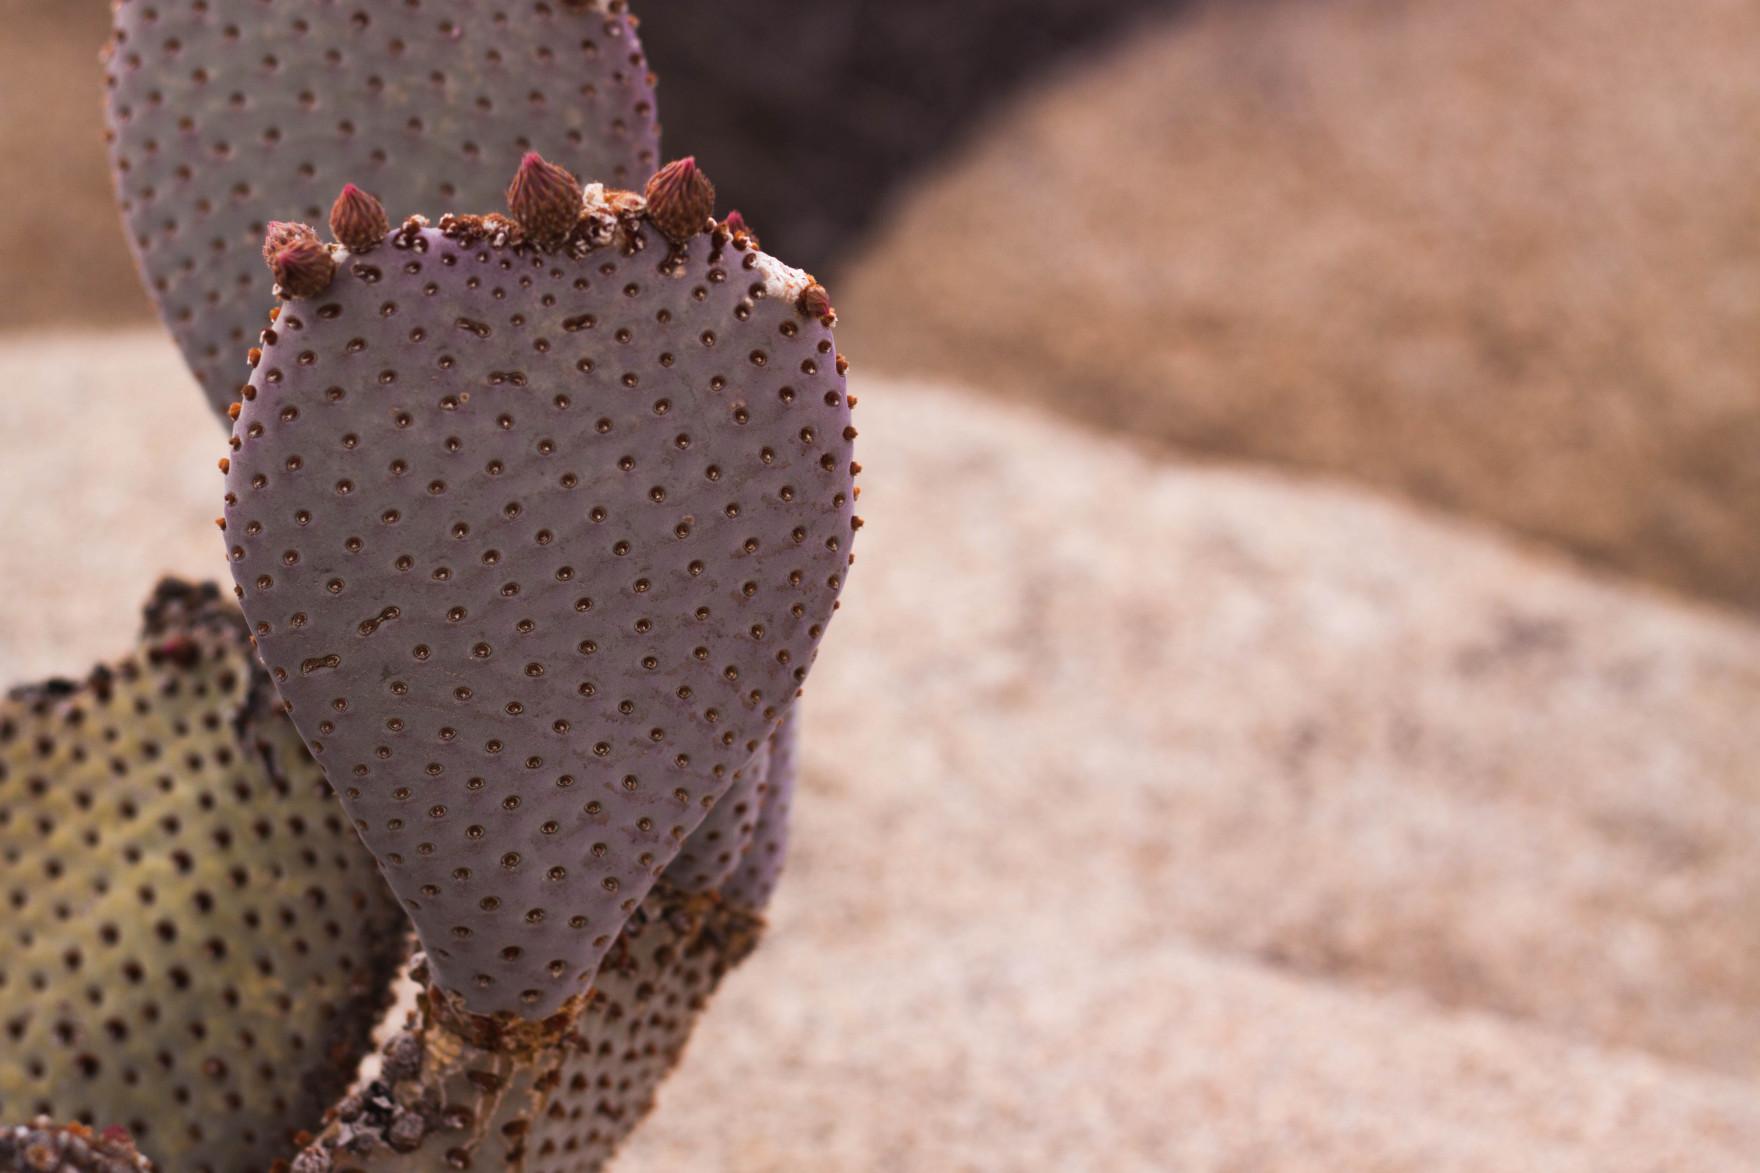 Bored Vegetarian Bethany Pickard Yucca Valley Joshua Tree Purple Cactus-15